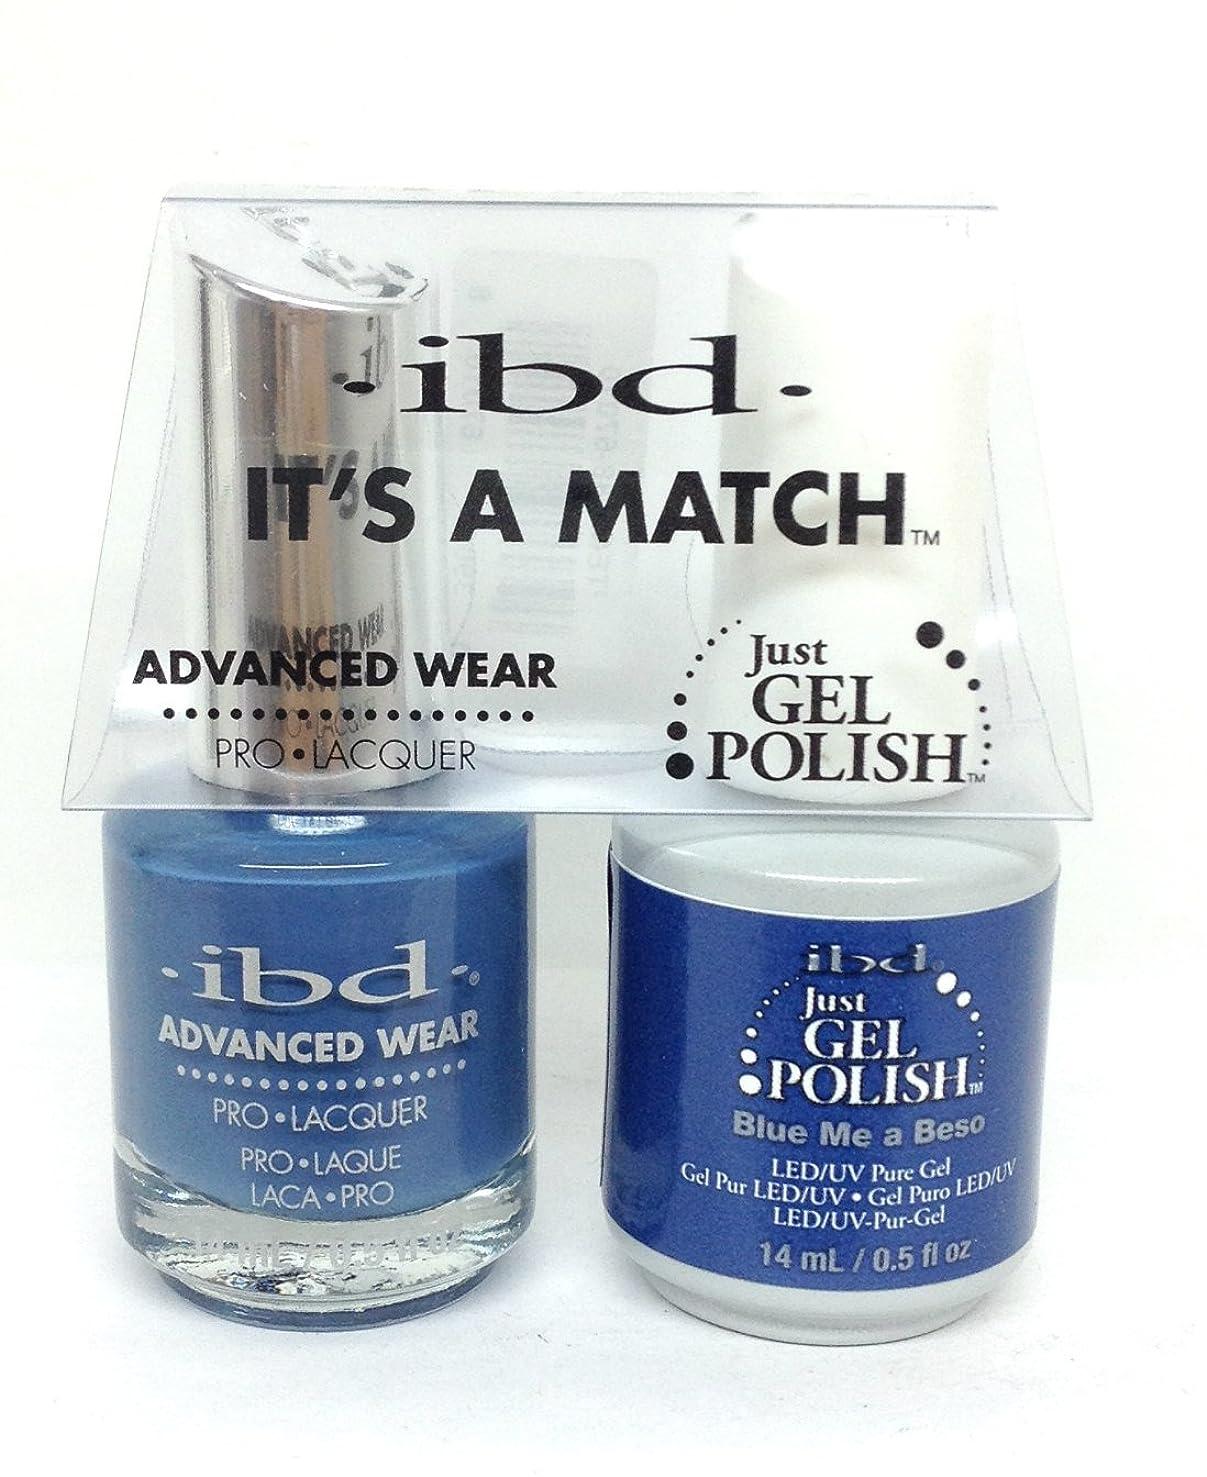 文化牽引道路ibd - It's A Match -Duo Pack- Love Lola Collection - Blue Me a Beso - 14 mL / 0.5 oz Each